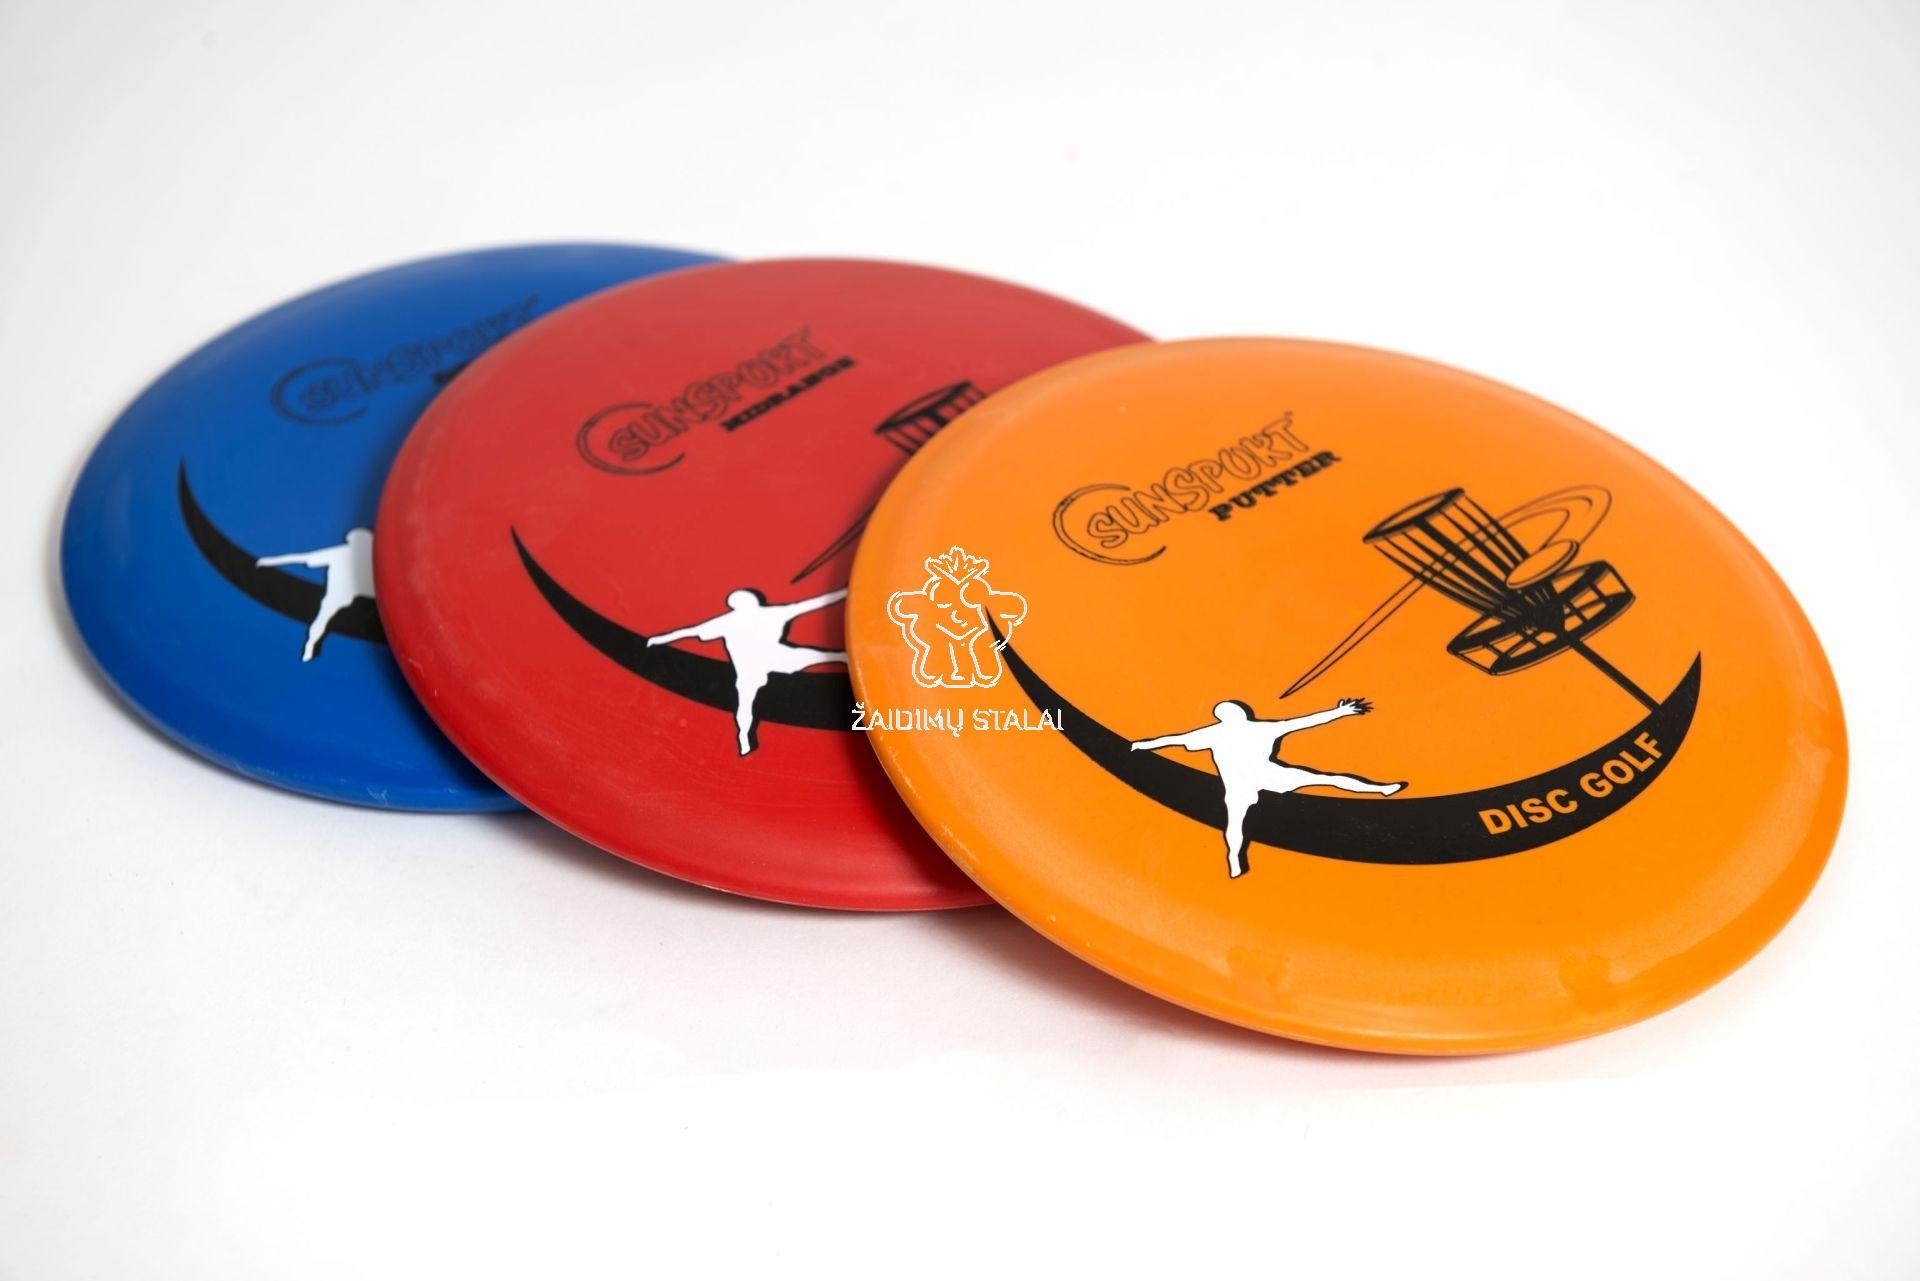 Discgolf lėkšcių rinkinys: Driver, Mid Range & Putter